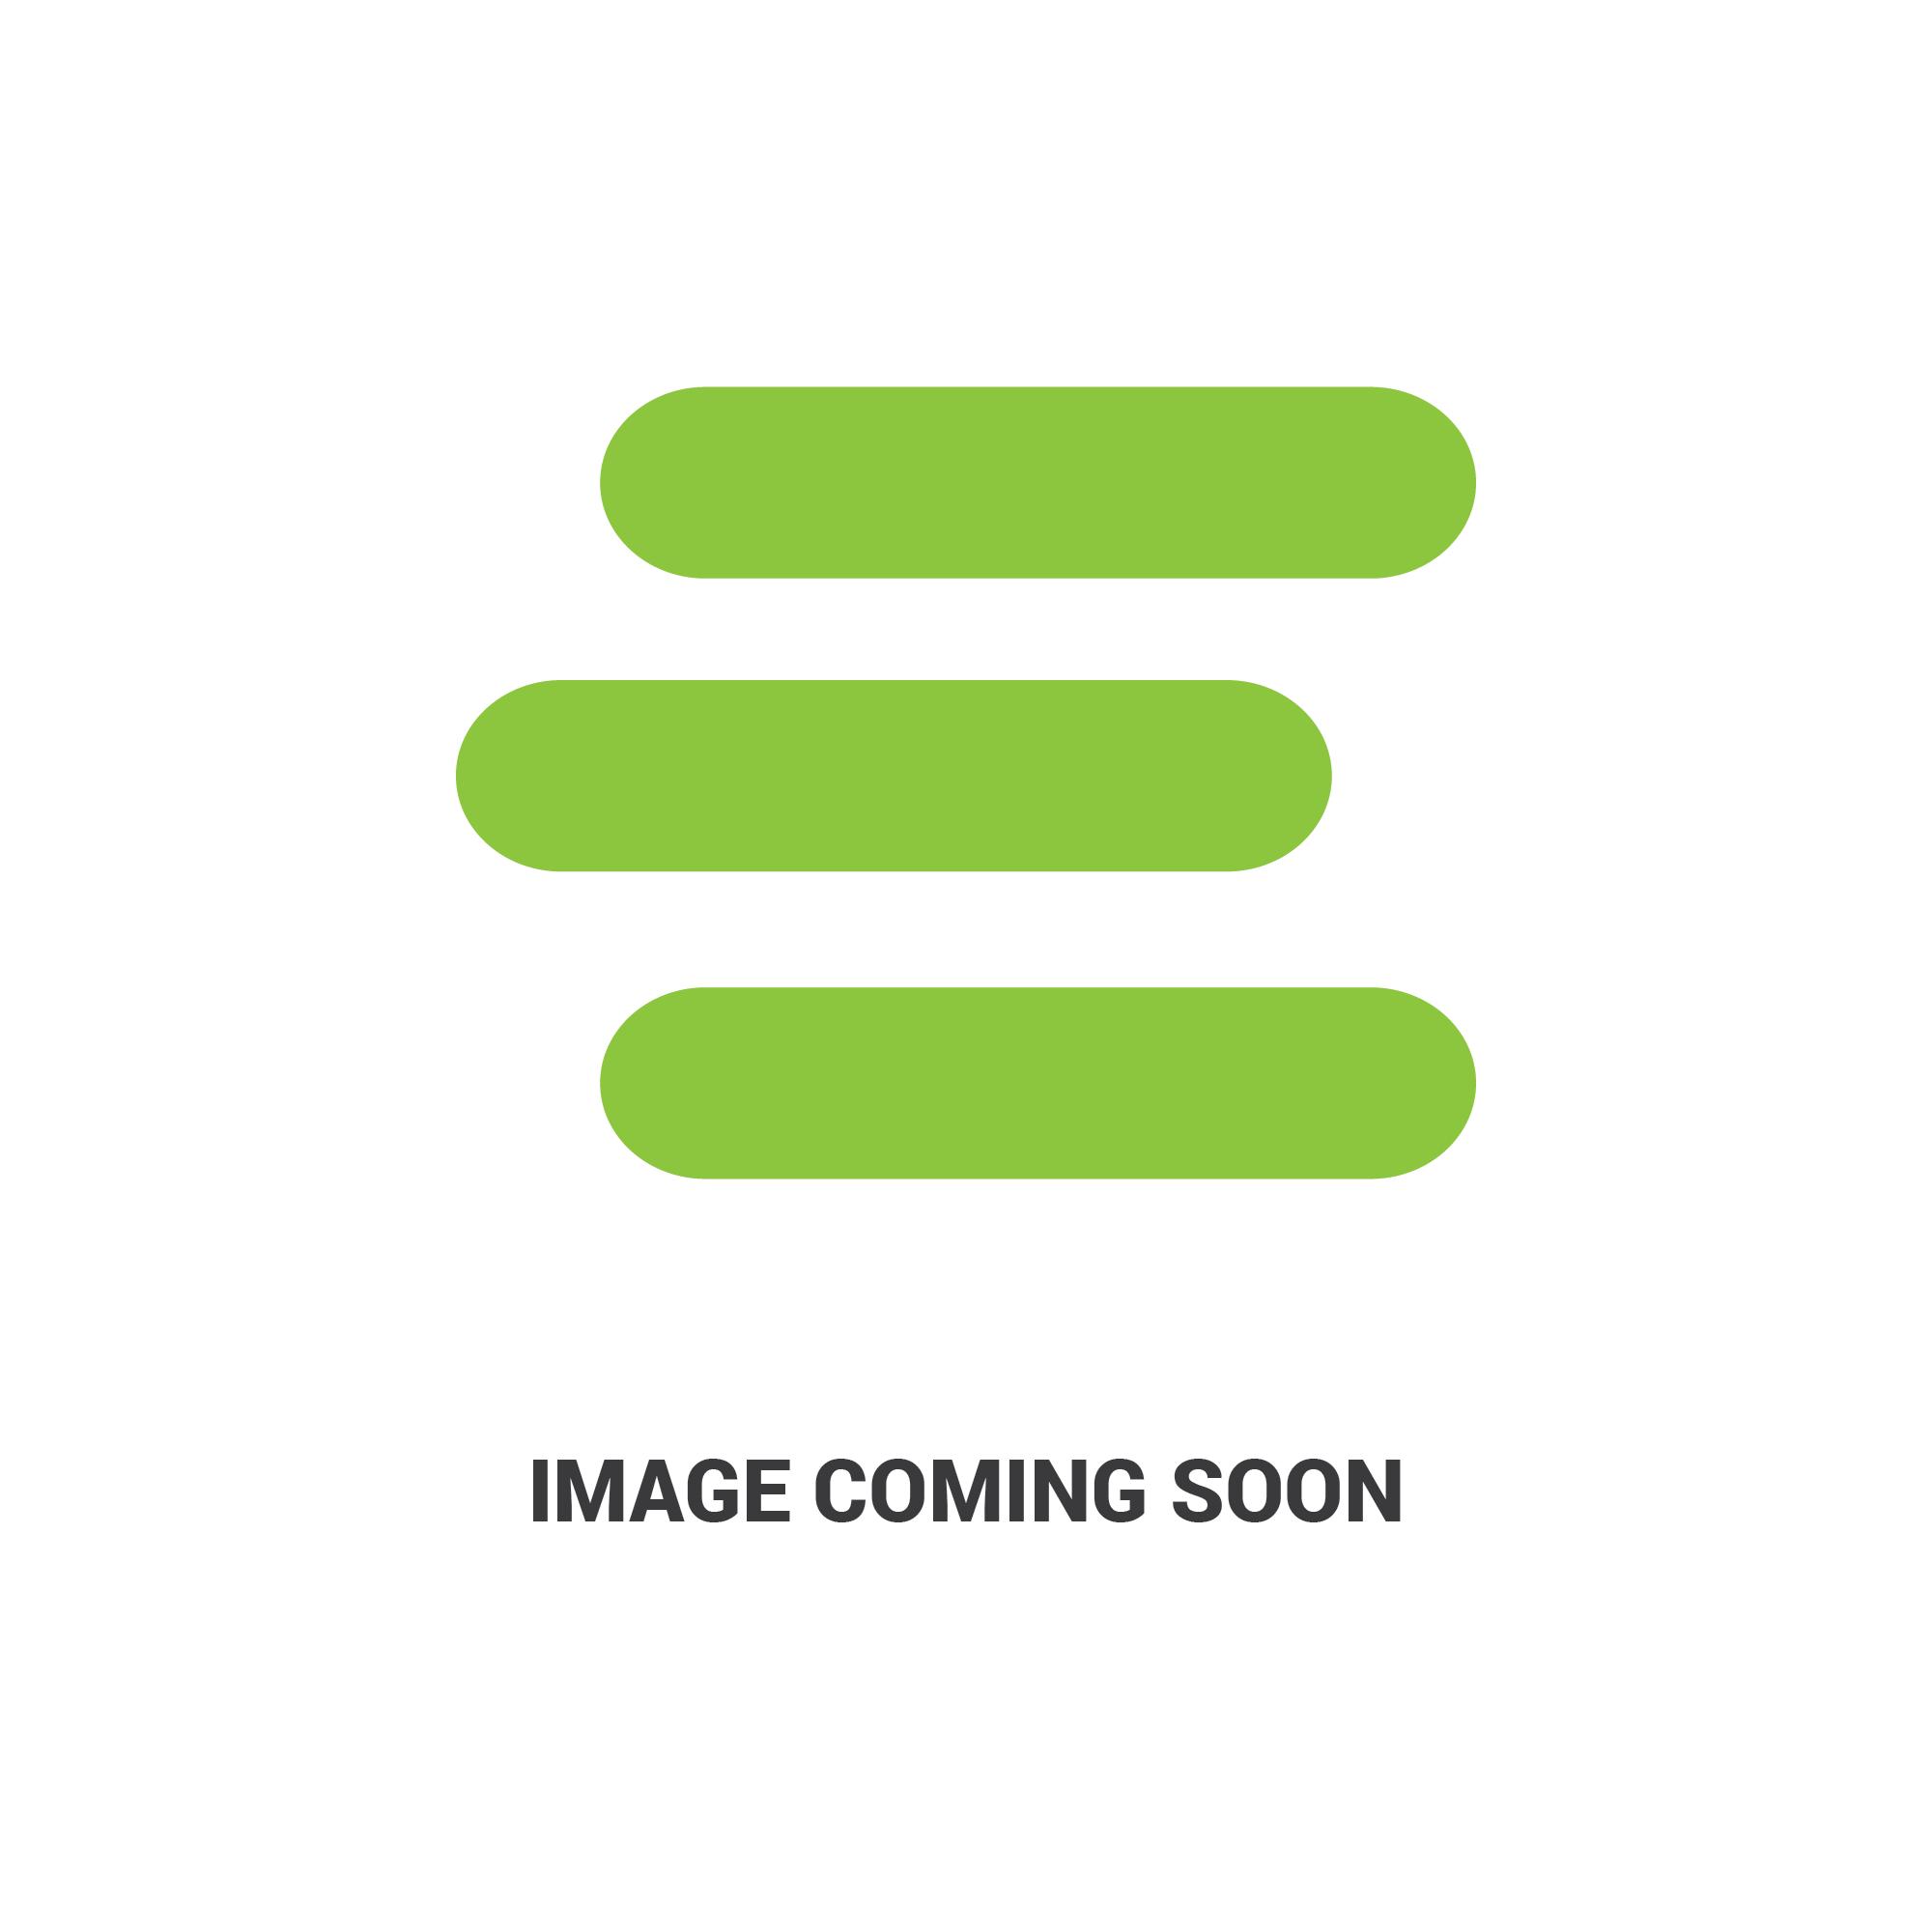 E-16032-51010edit 3.jpg